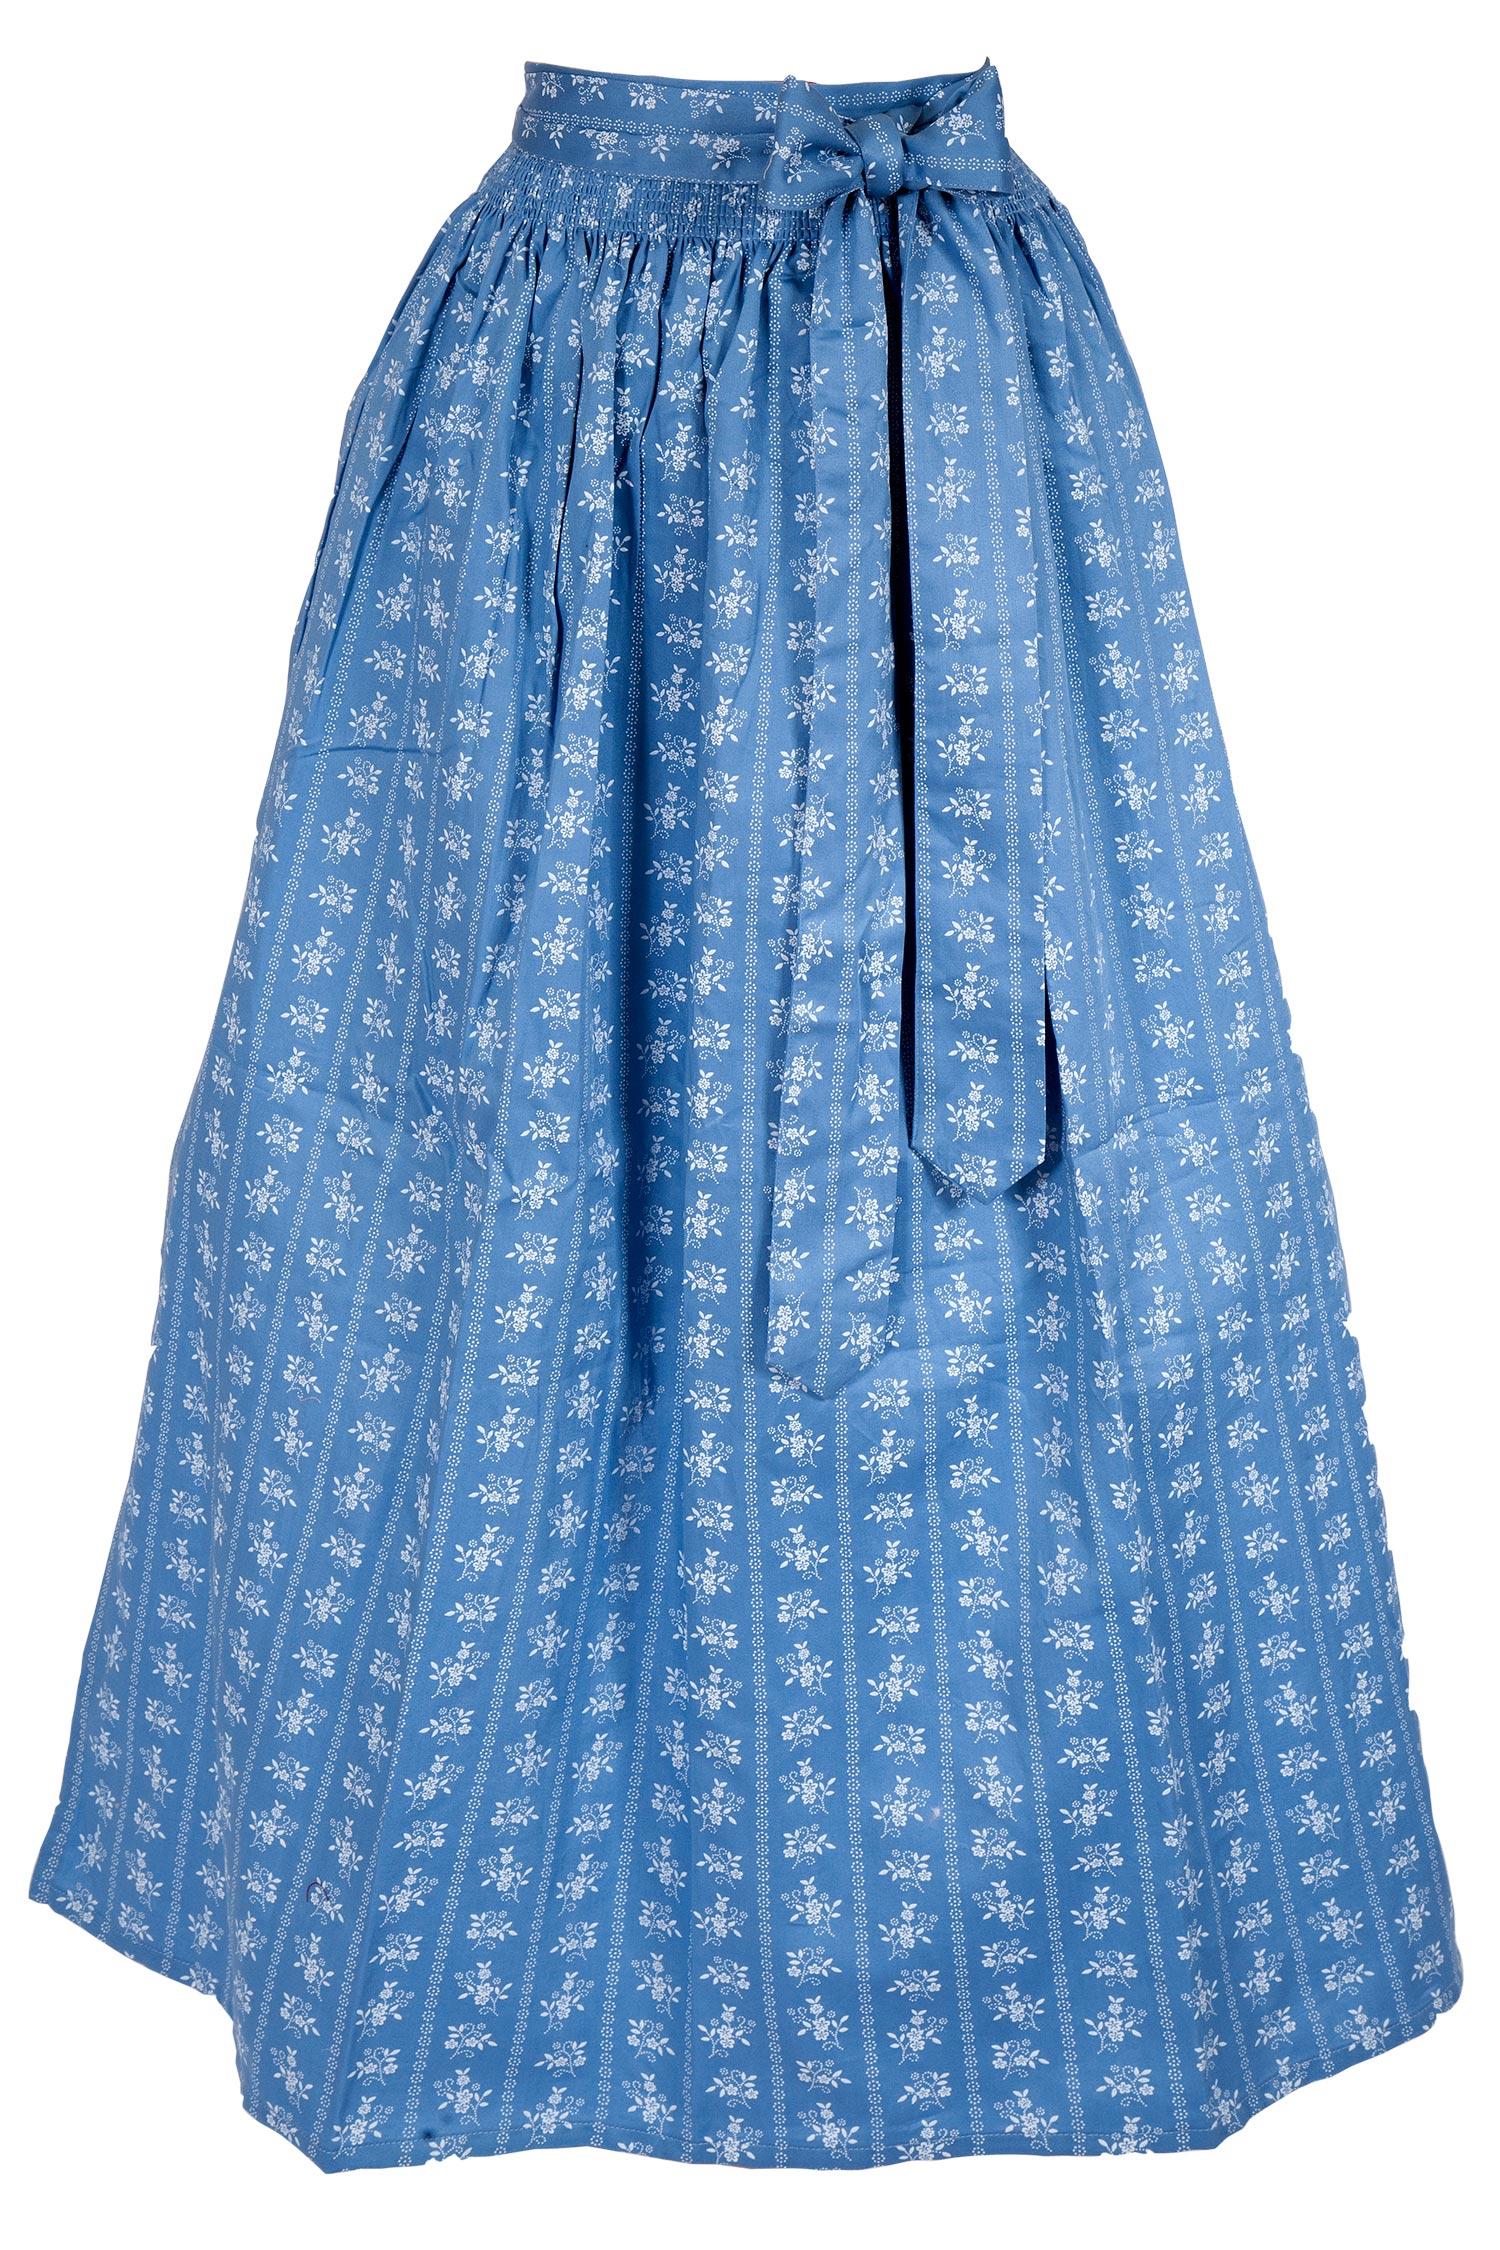 6486a60f41d802 Dirndlschürze lang aus Baumwolle in blau | Wirkes